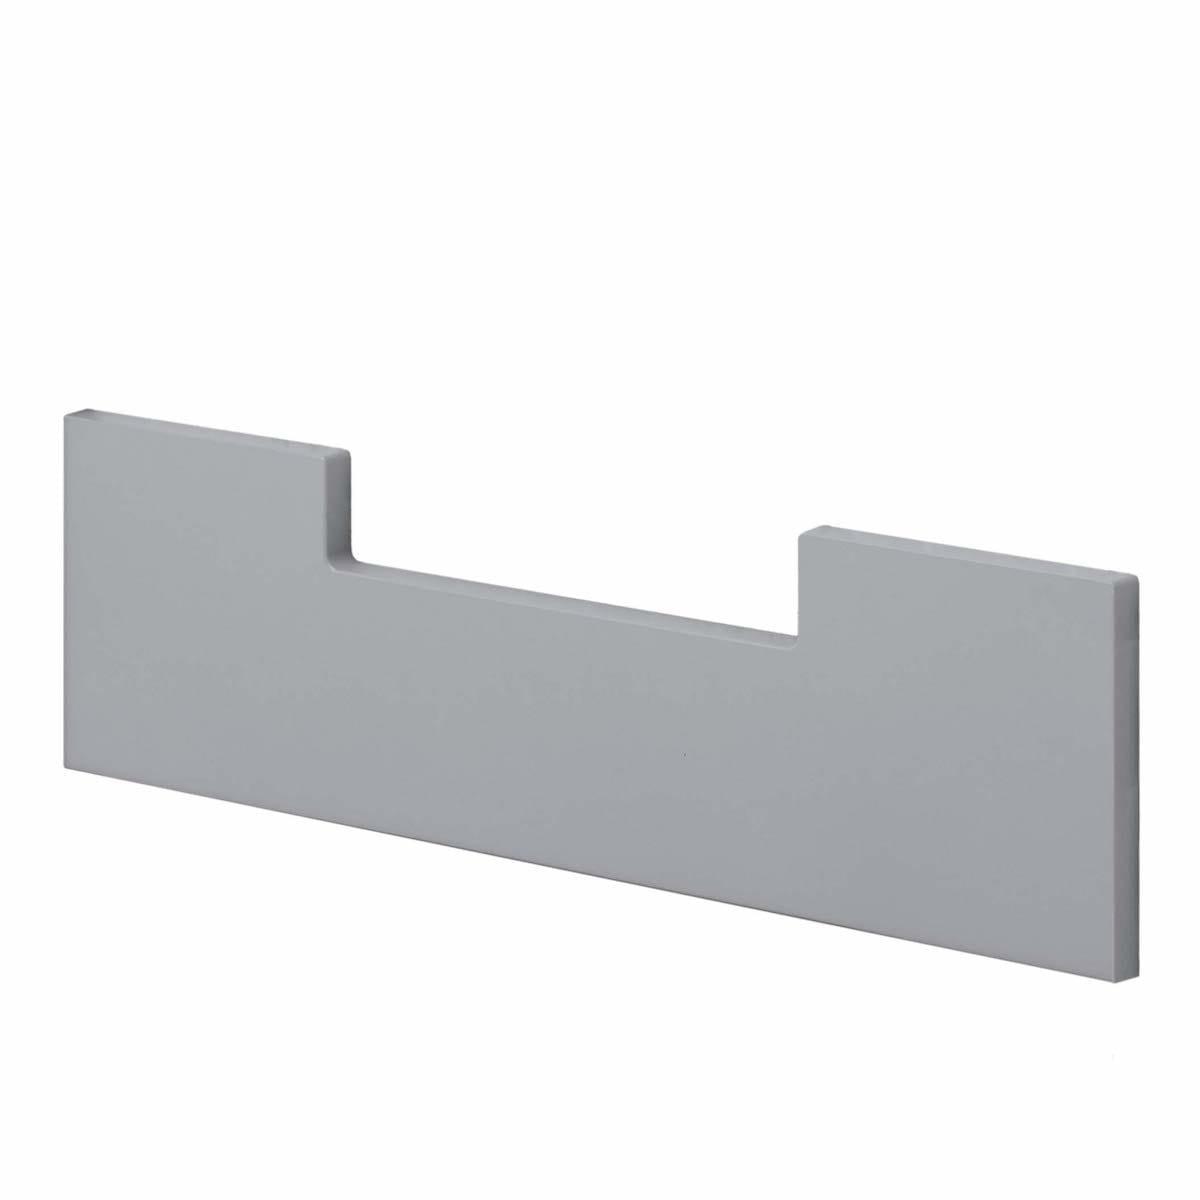 Barrera seguridad cuna 60x120cm Lifetime gris